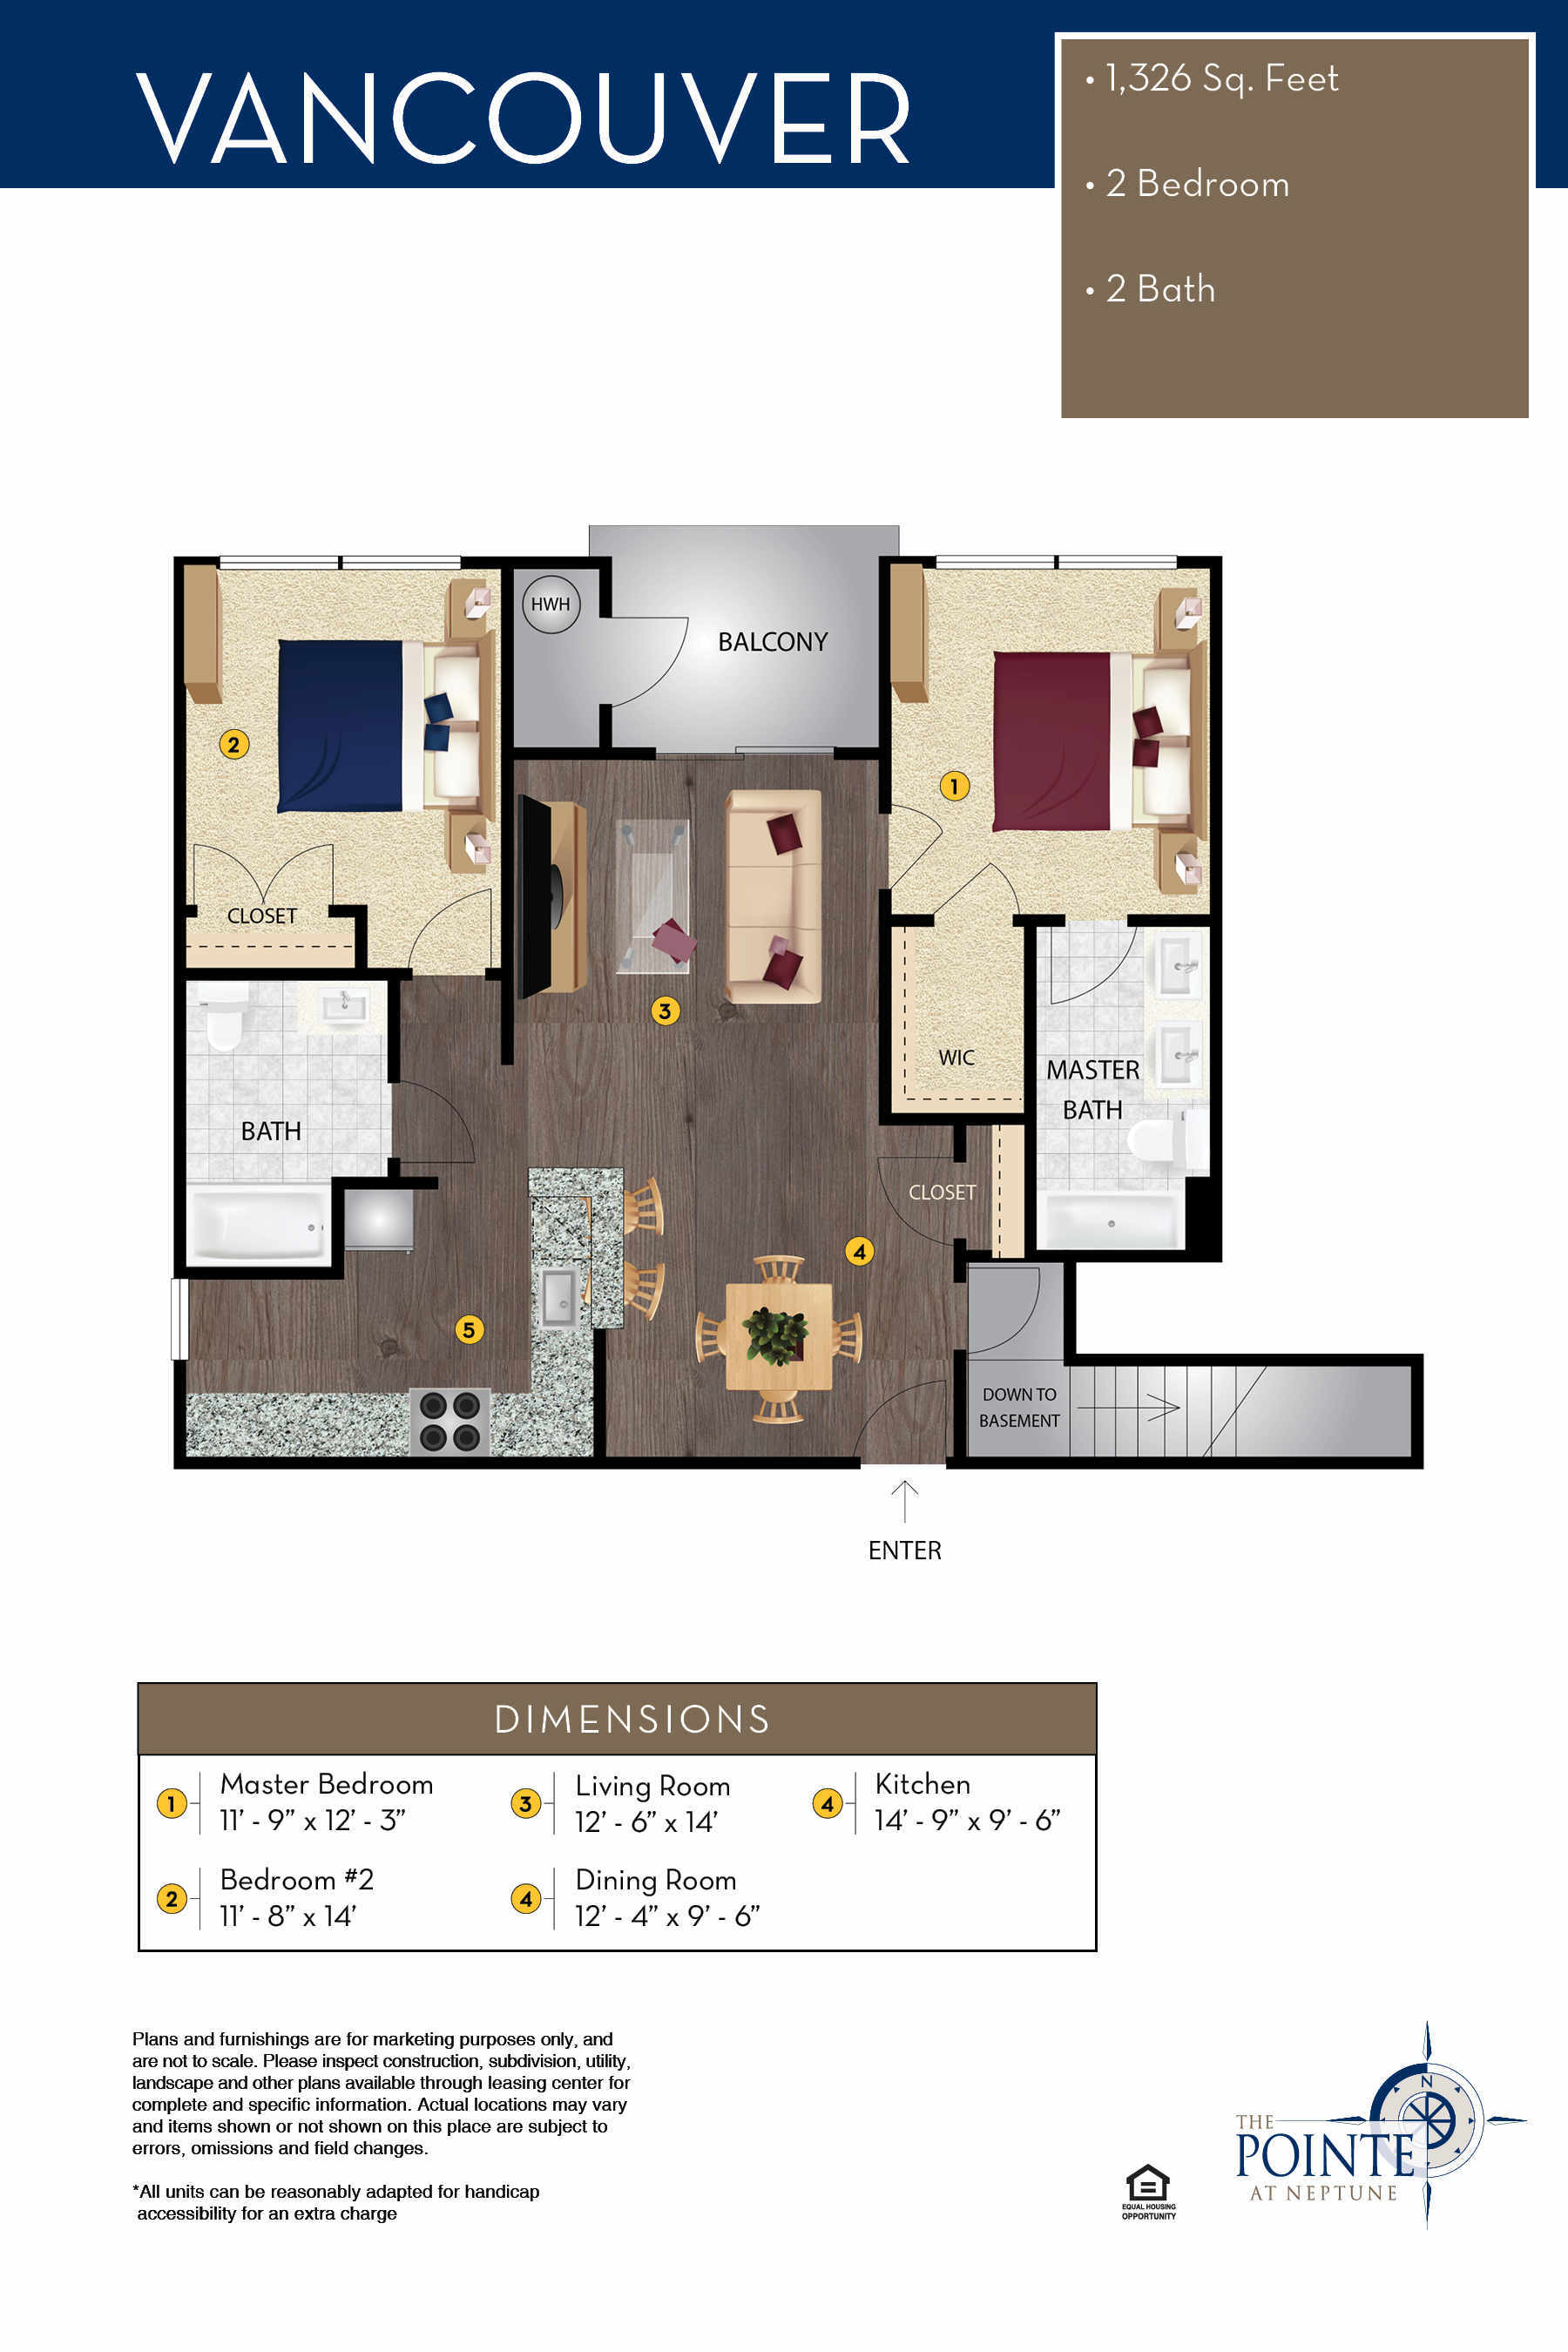 The Vancouver Floor Plan